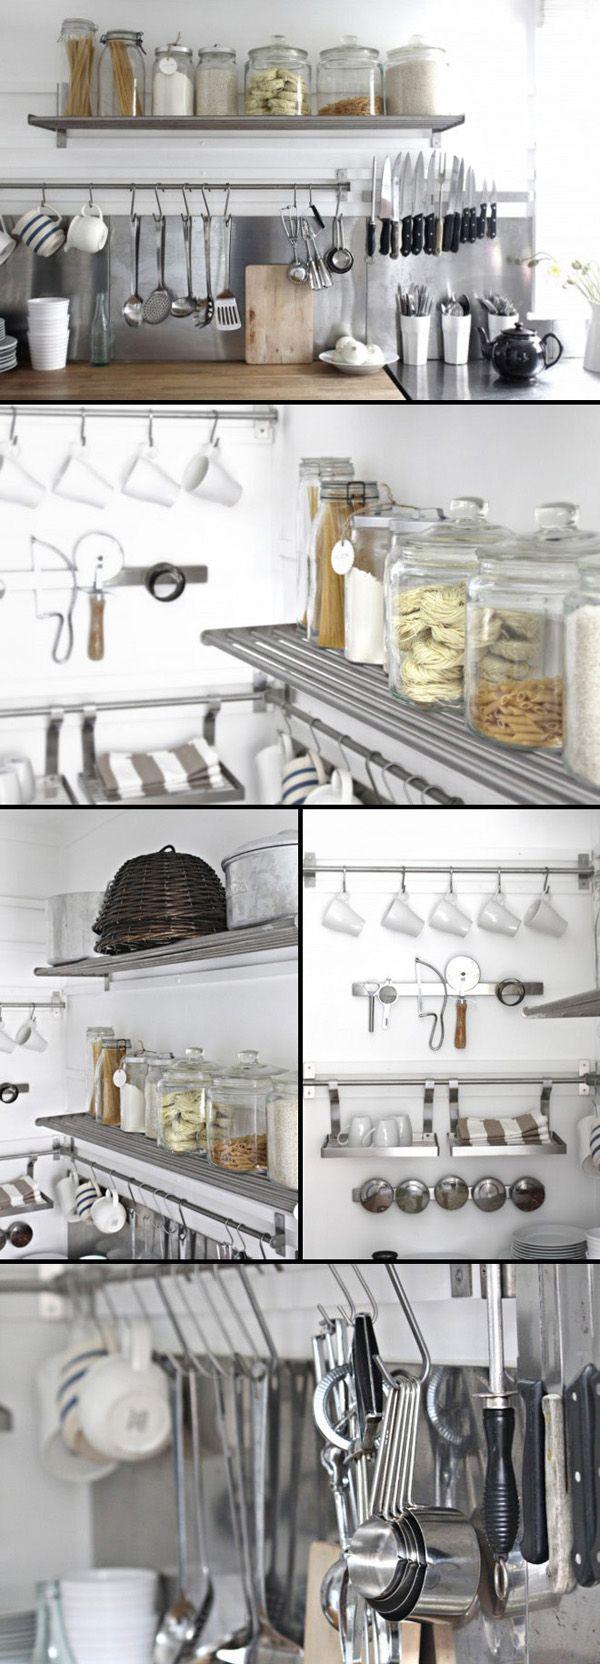 Ikea kitchen shelves stainless steel - Beach Cottage Kitchen Organization Part I Kitchen Shelvesikea